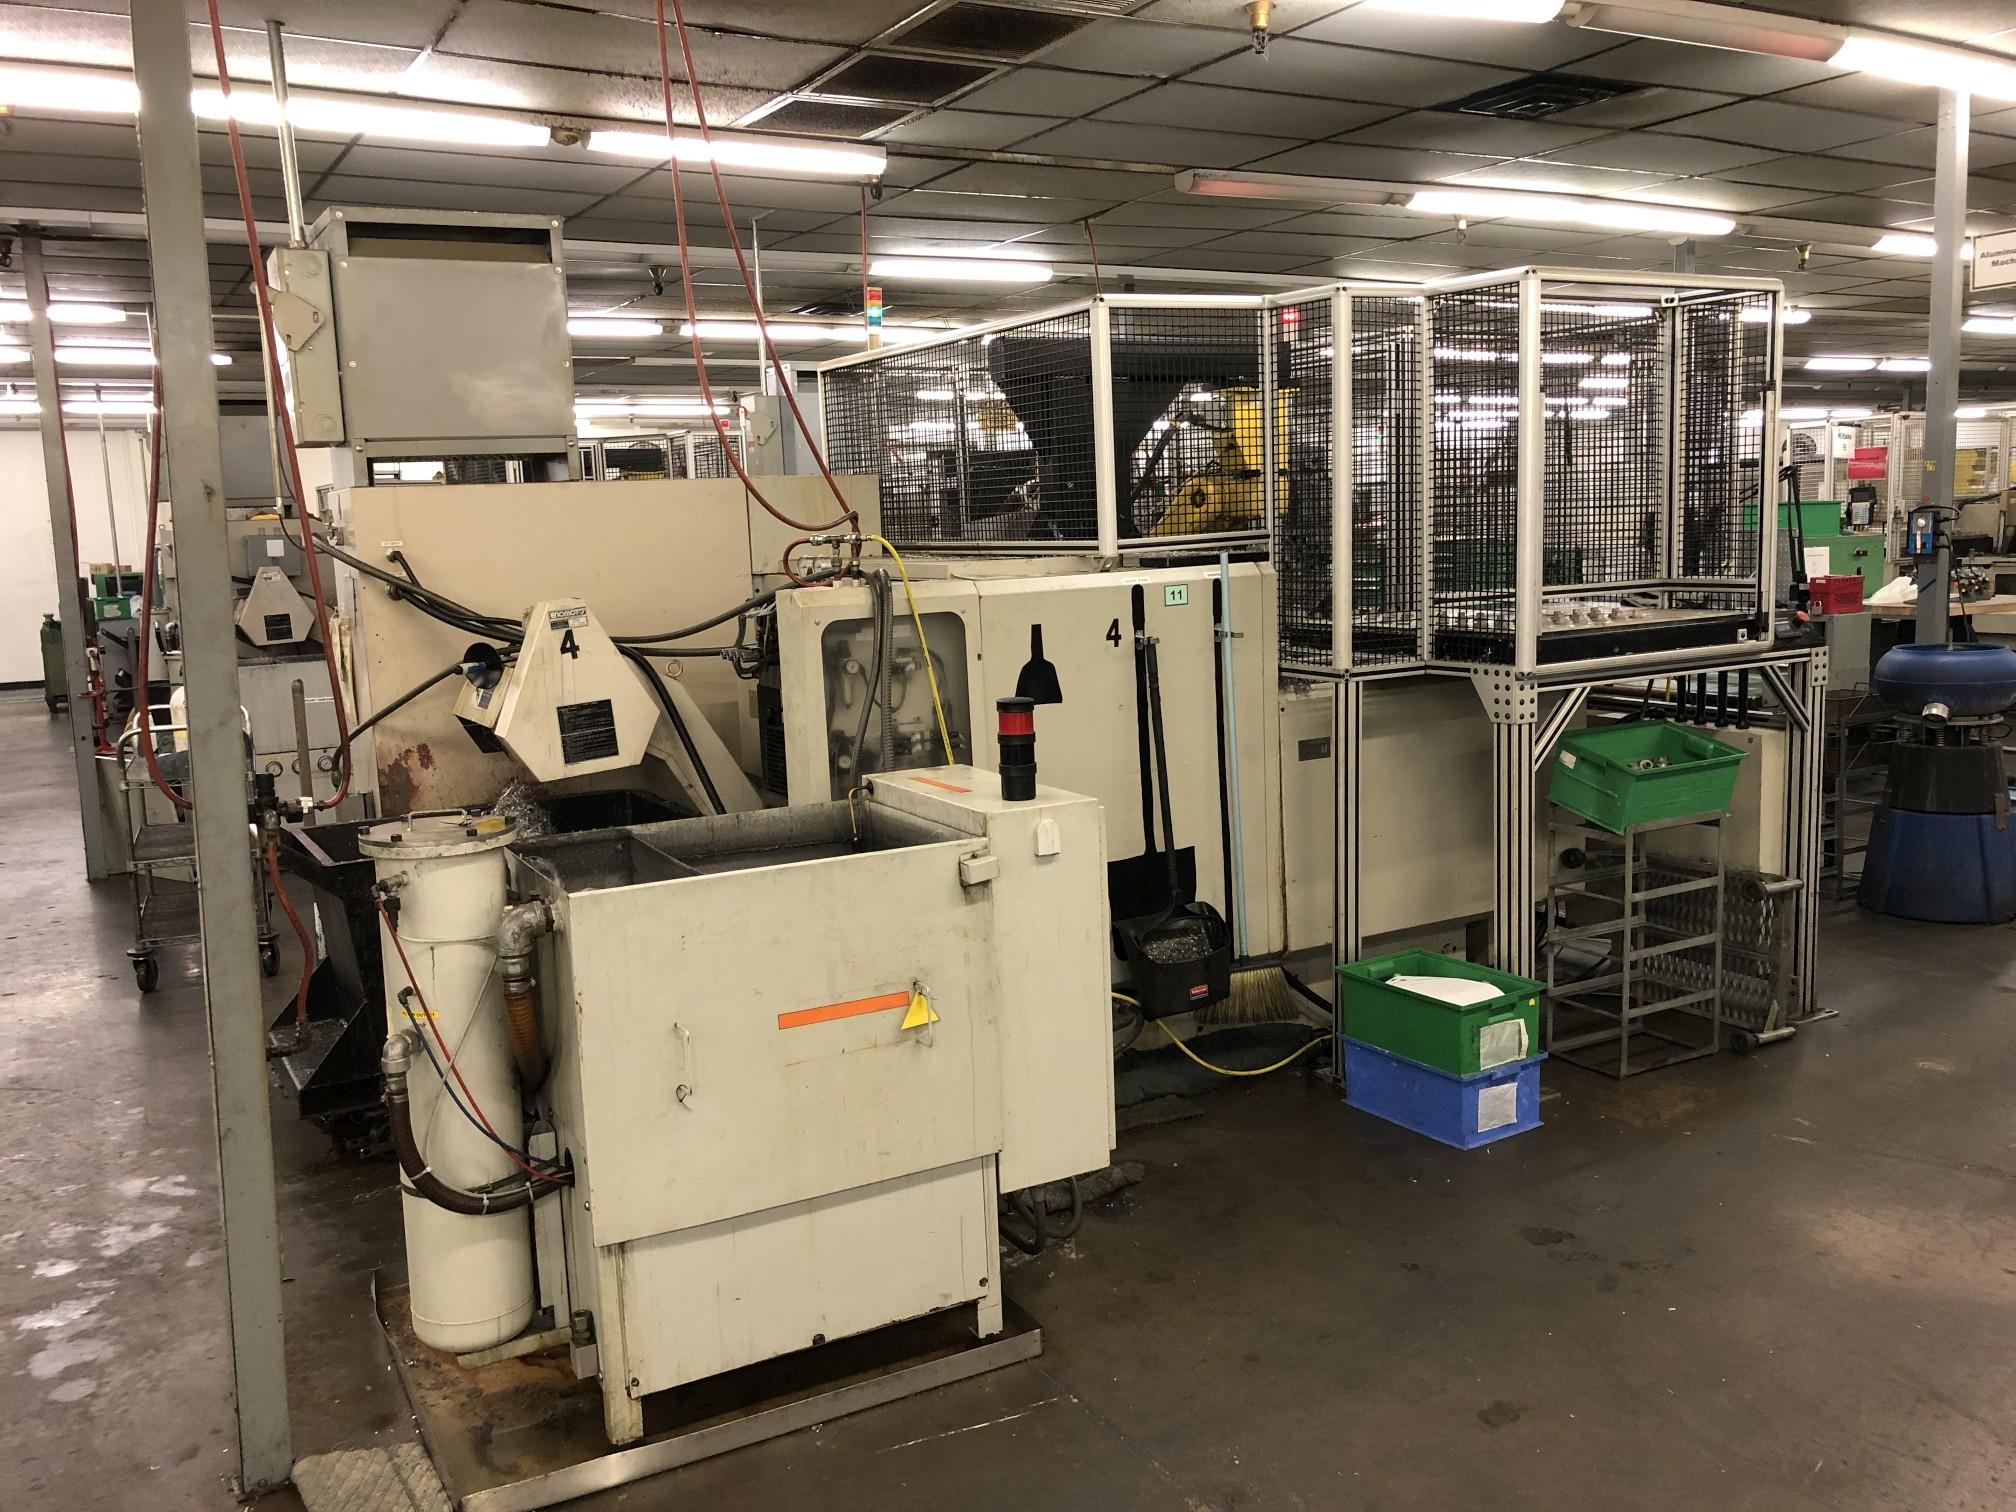 1999 Kitako MT4-200M Multi-Spindle CNC Turning Mill - Image 8 of 19